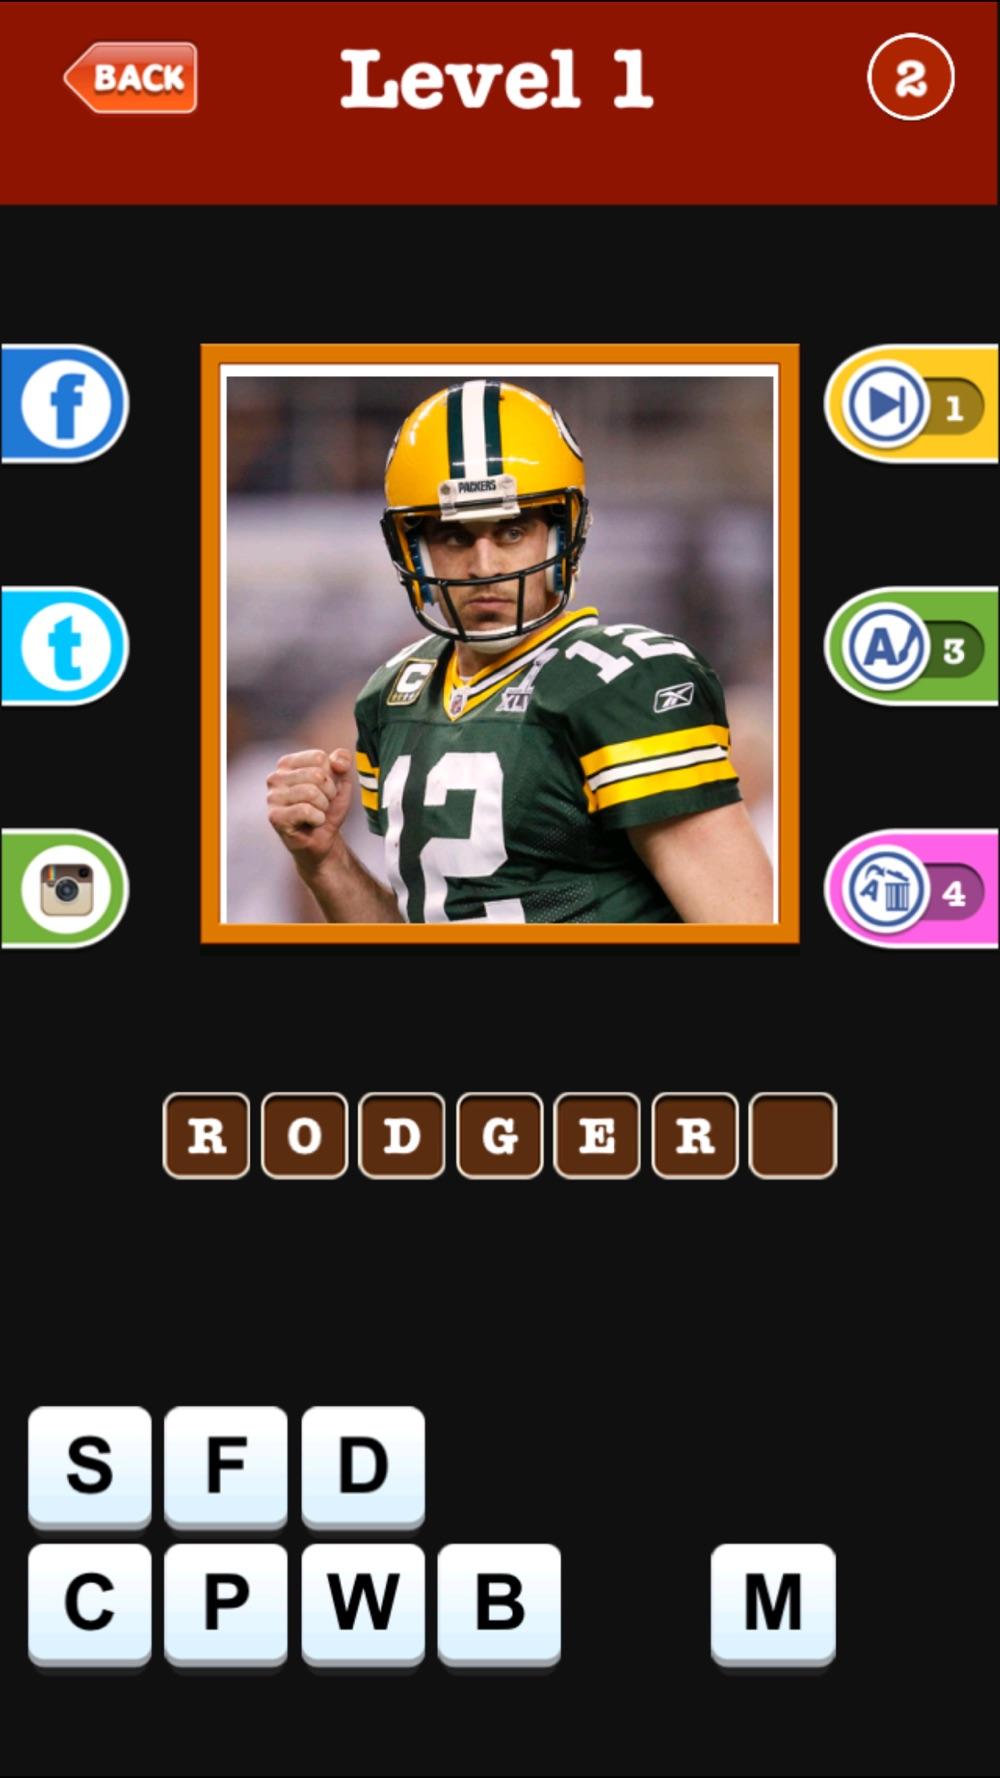 American Football Super Stars Picture Quiz - 2015-16 Season Edition hack tool